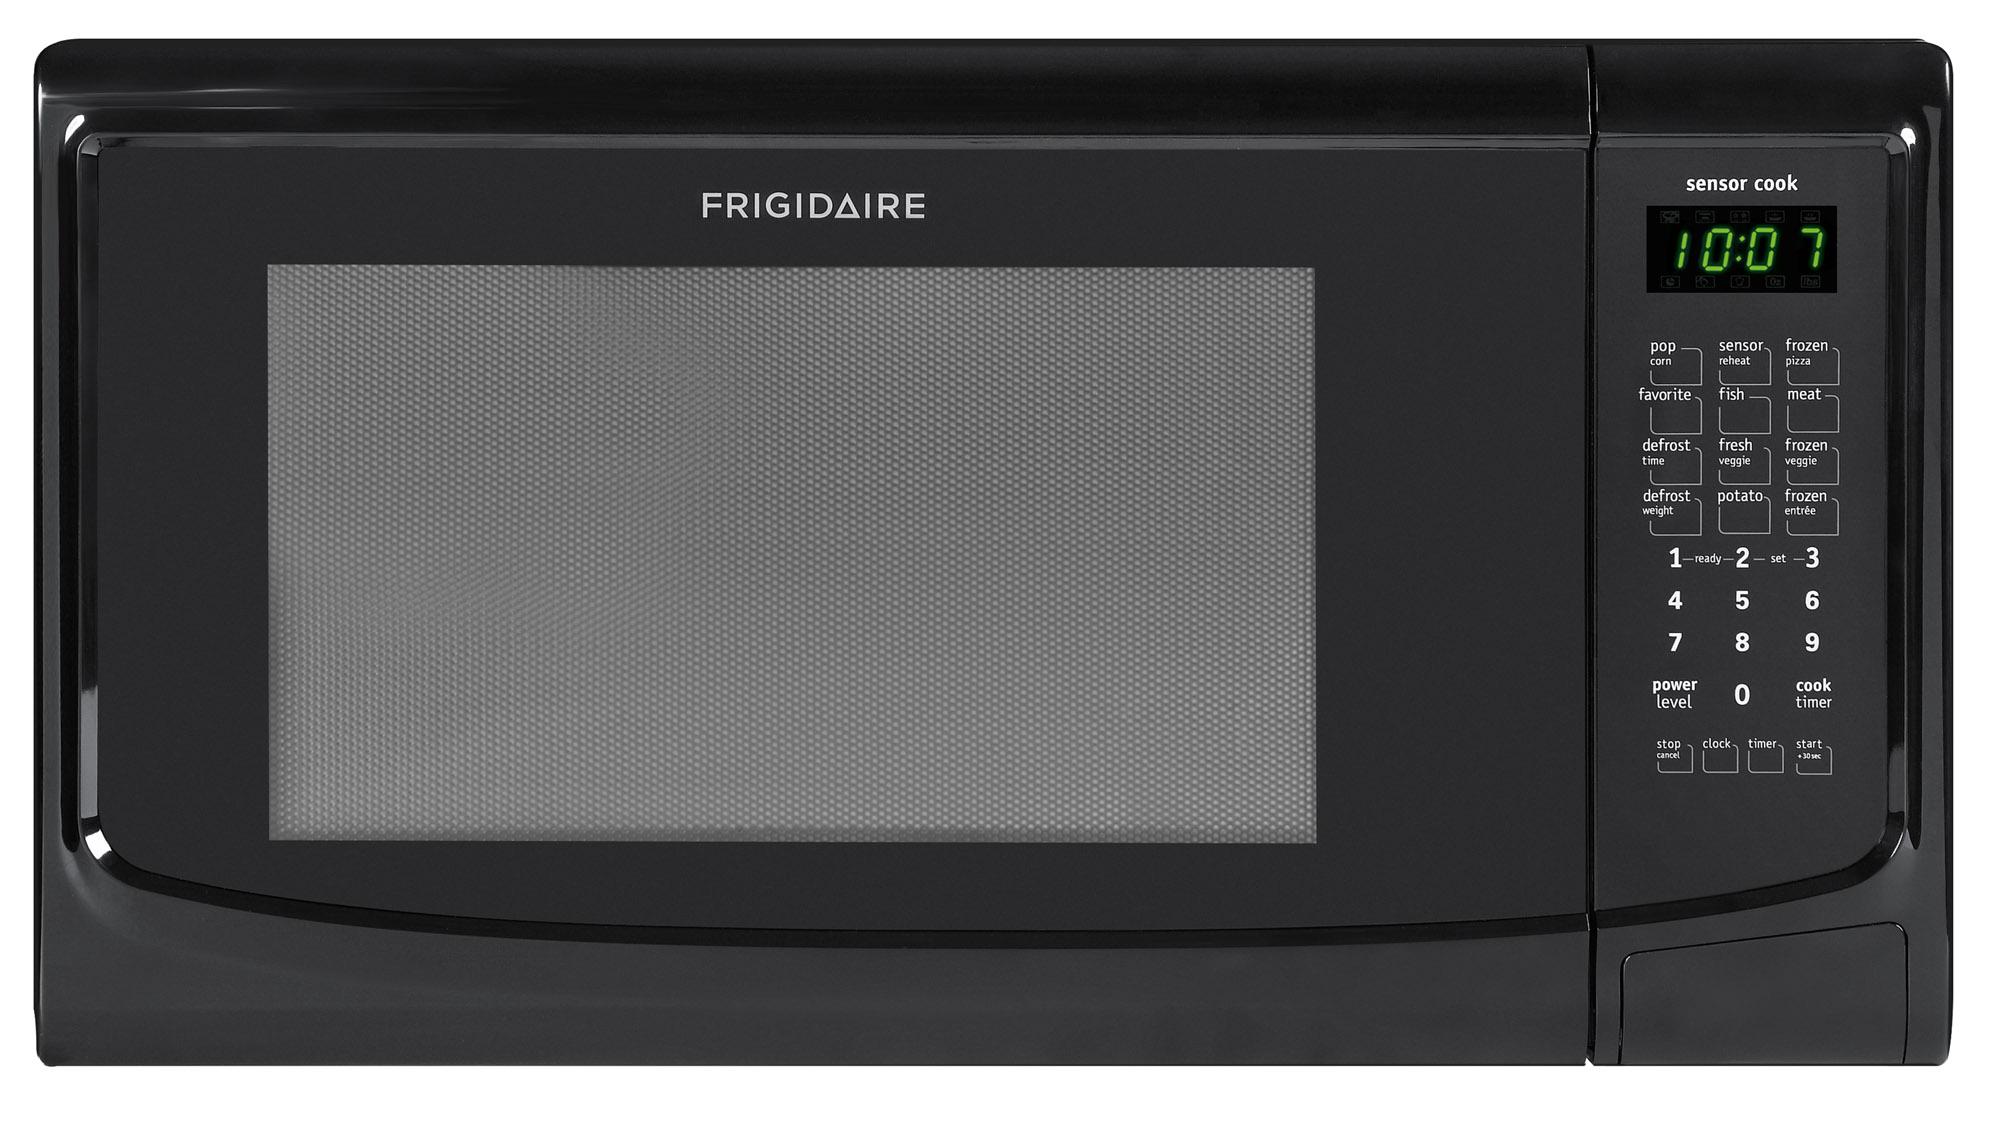 Frigidaire Microwave Model FFCE1431LB Parts